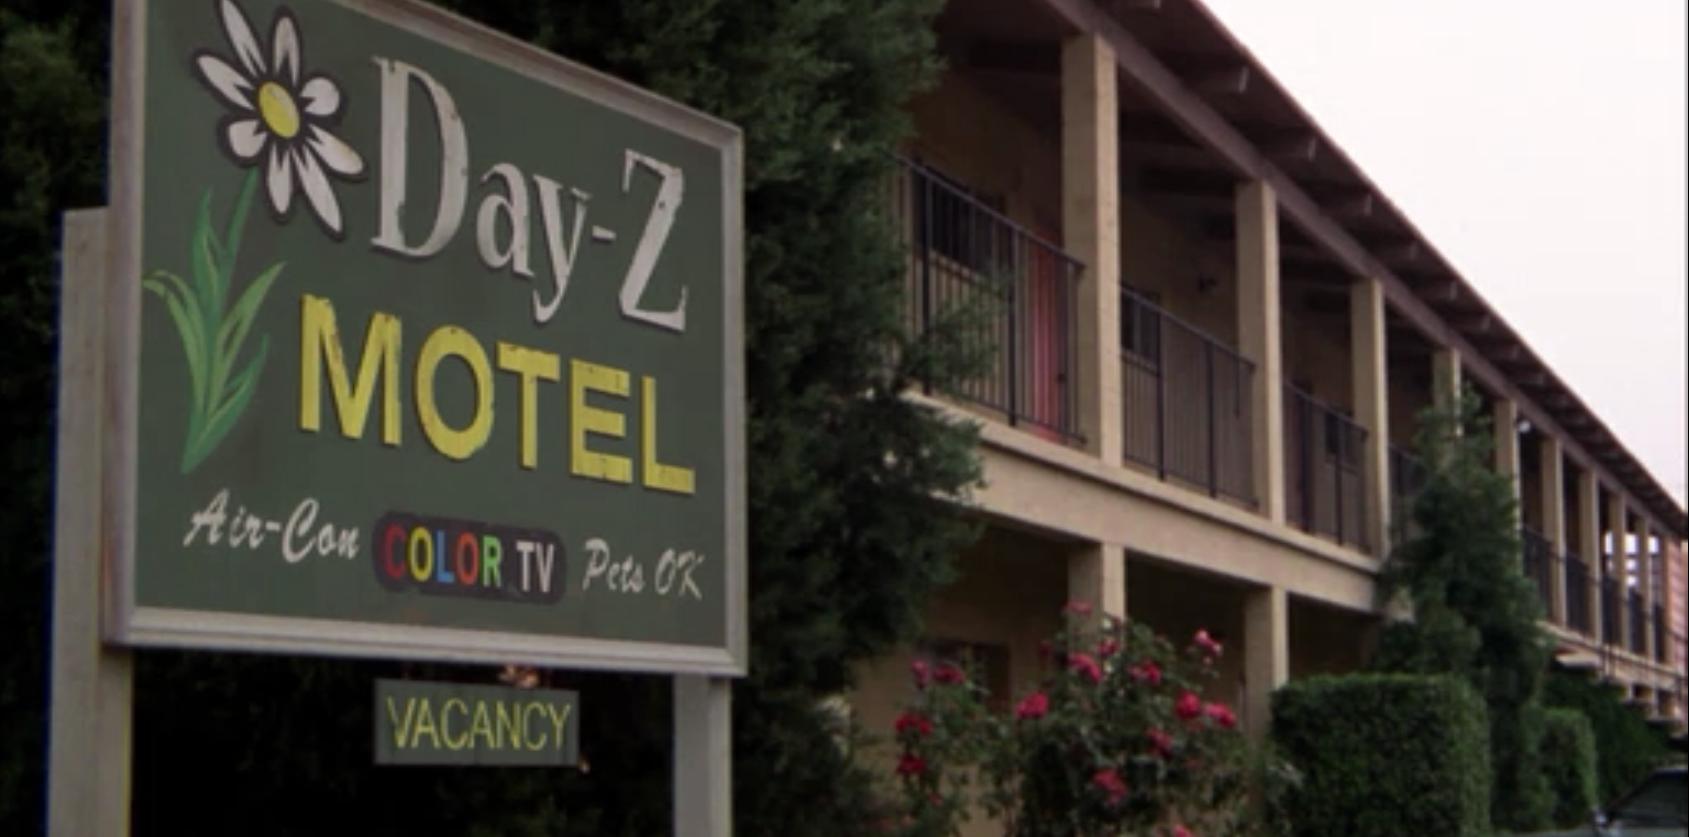 DAY Z Motel. Day z Motel.. Oh, I get it. Rosebush instead of daisies.